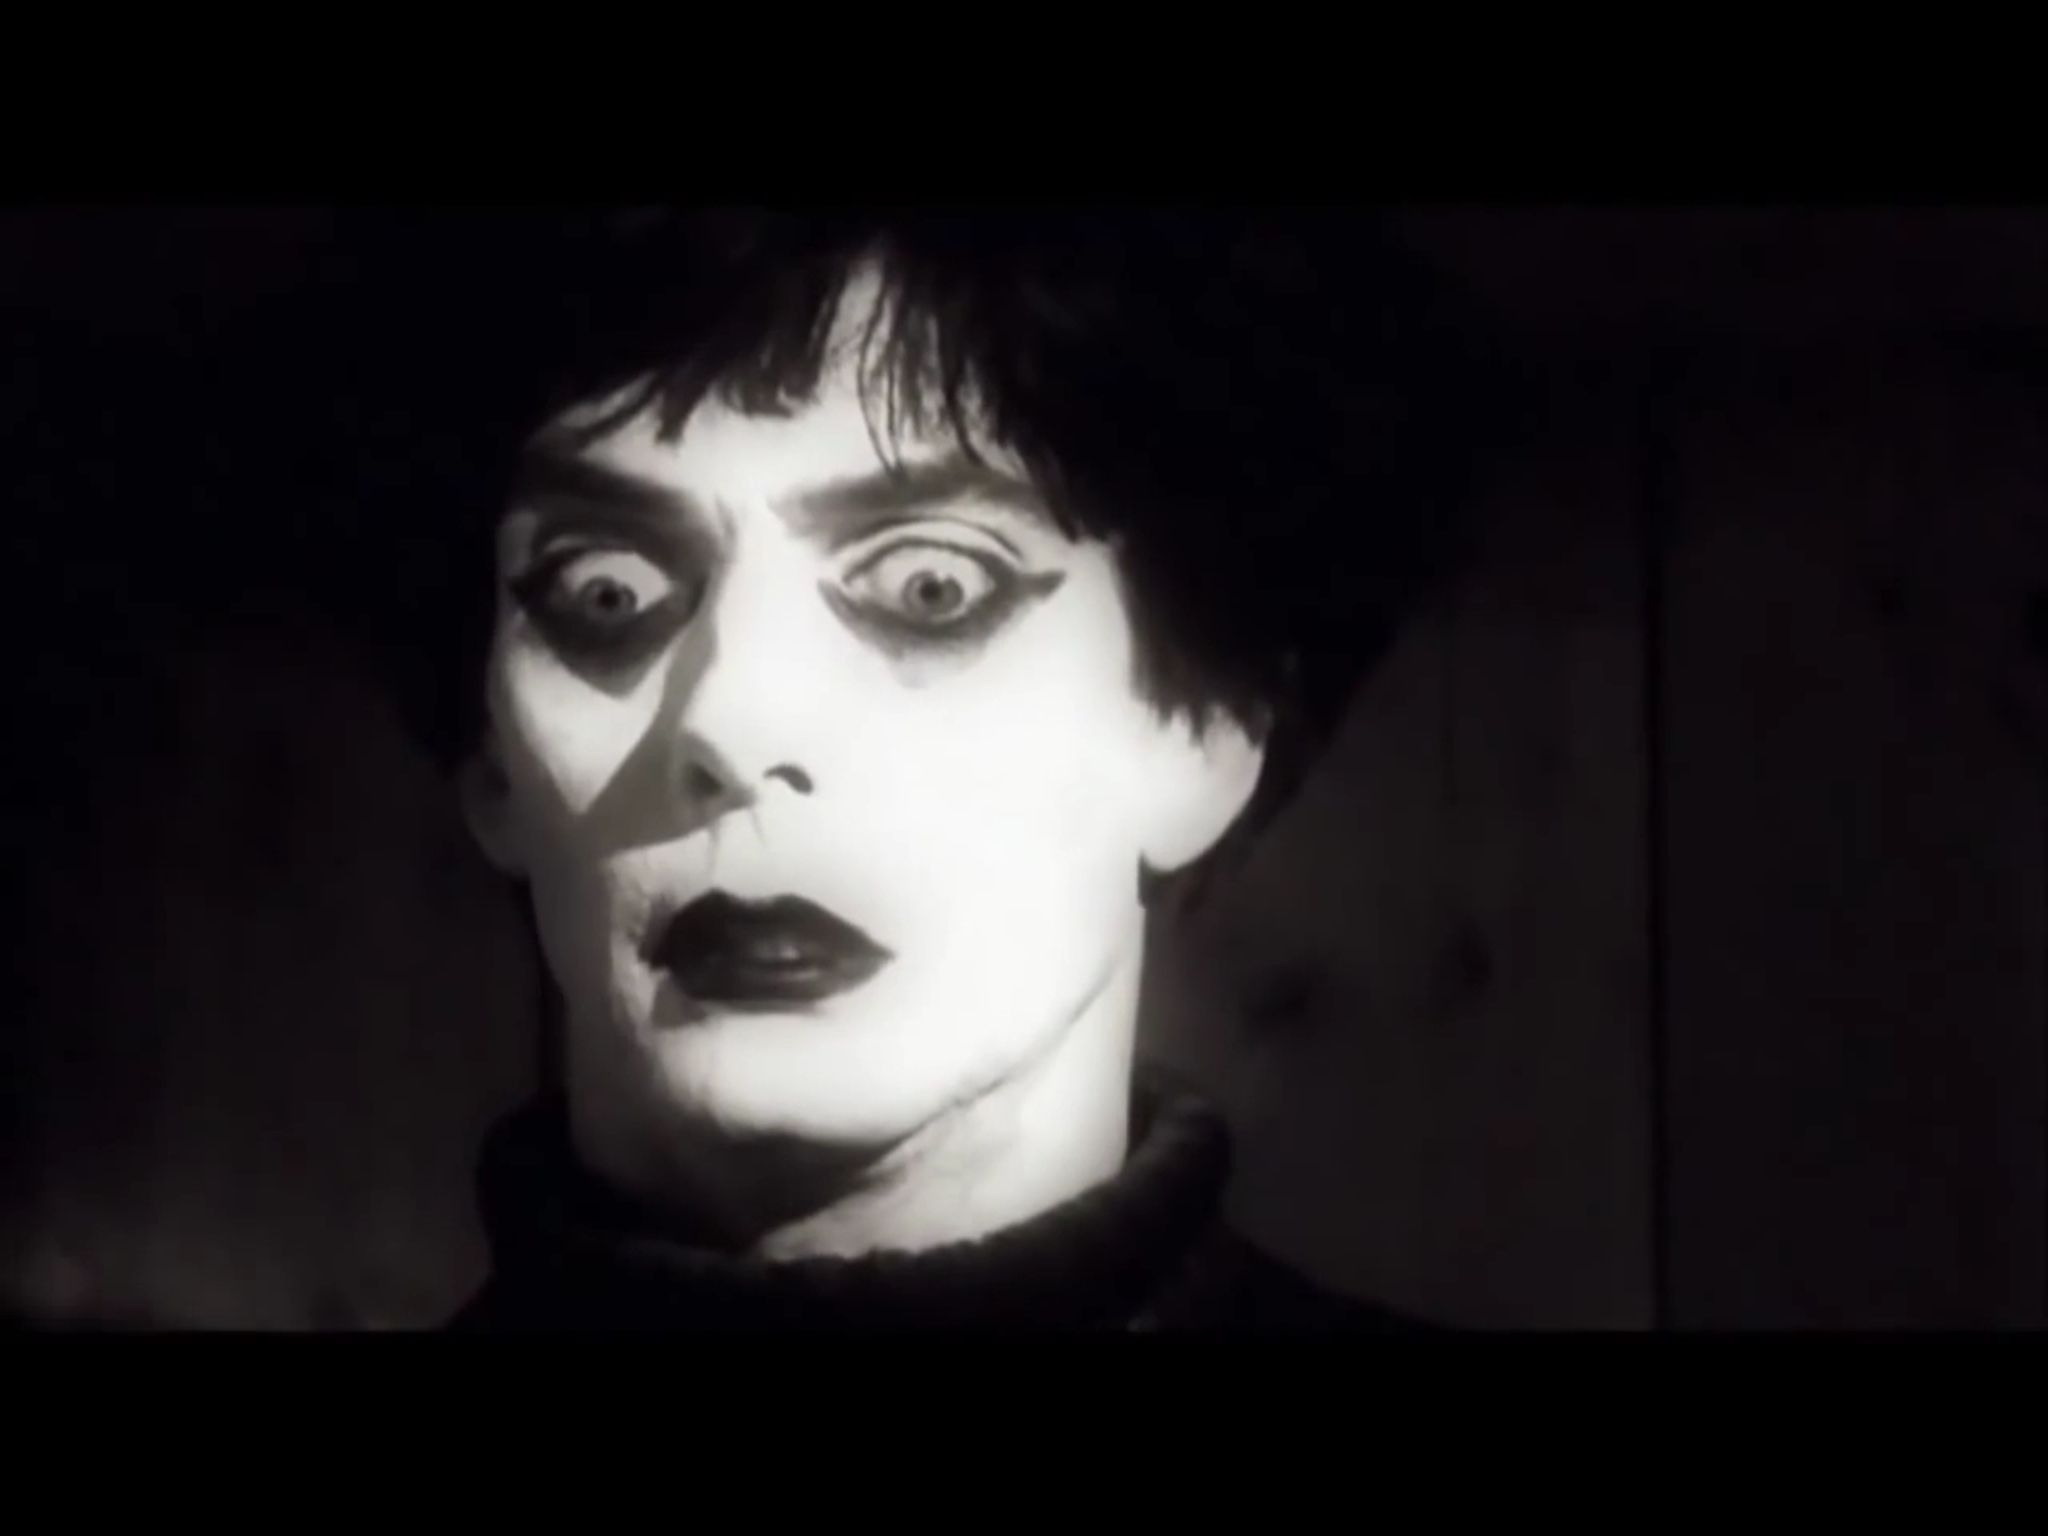 Doug Jones As Cesare In The Cabinet Of Doctor Caligari 2005